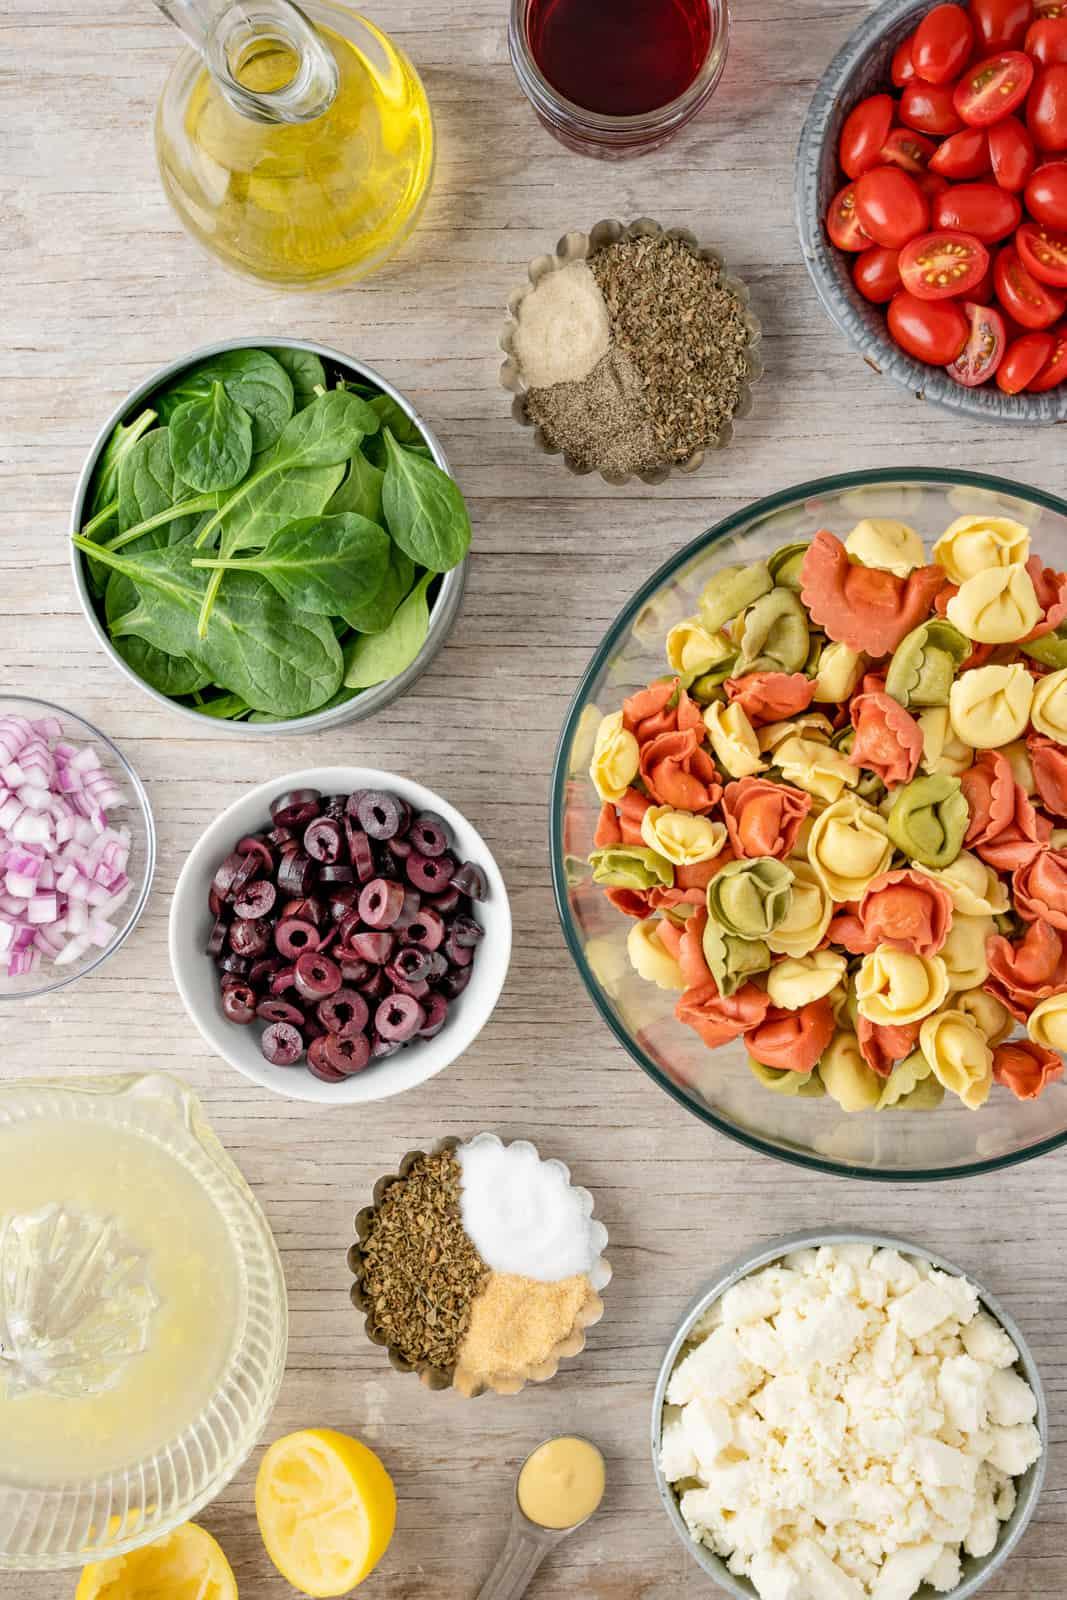 Ingredients needed to make Greek Pasta Salad